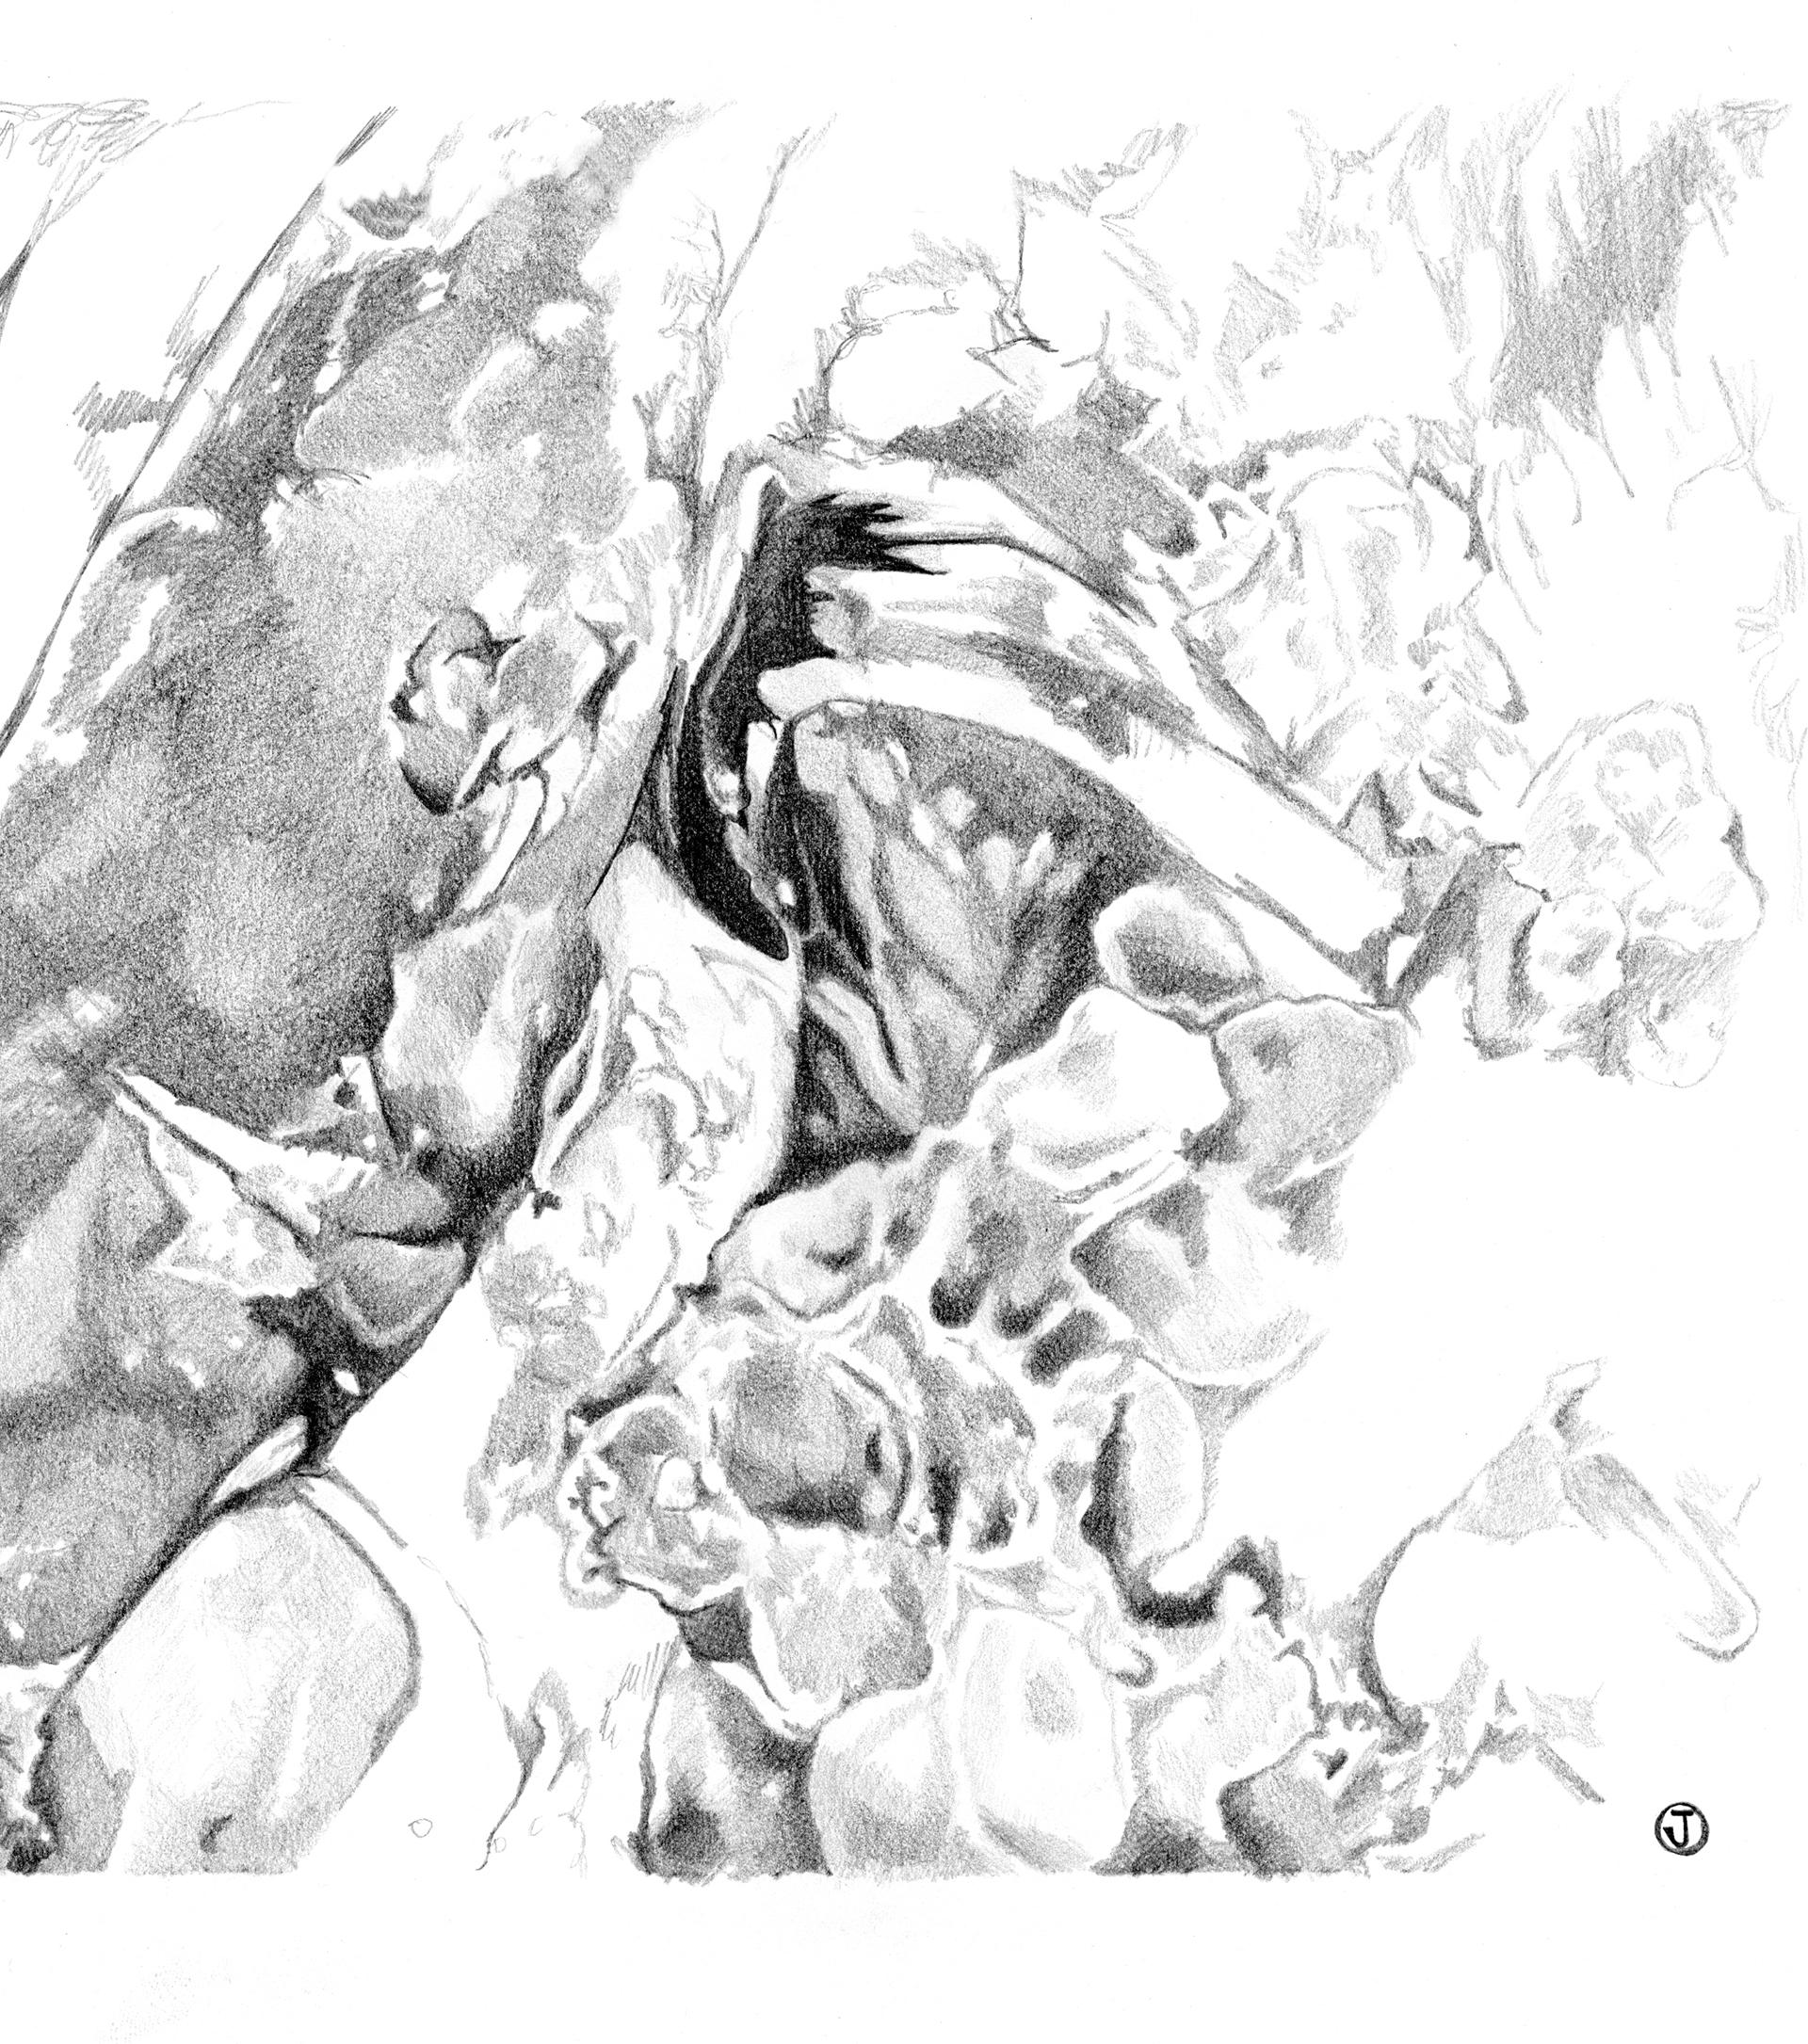 Texture Study III